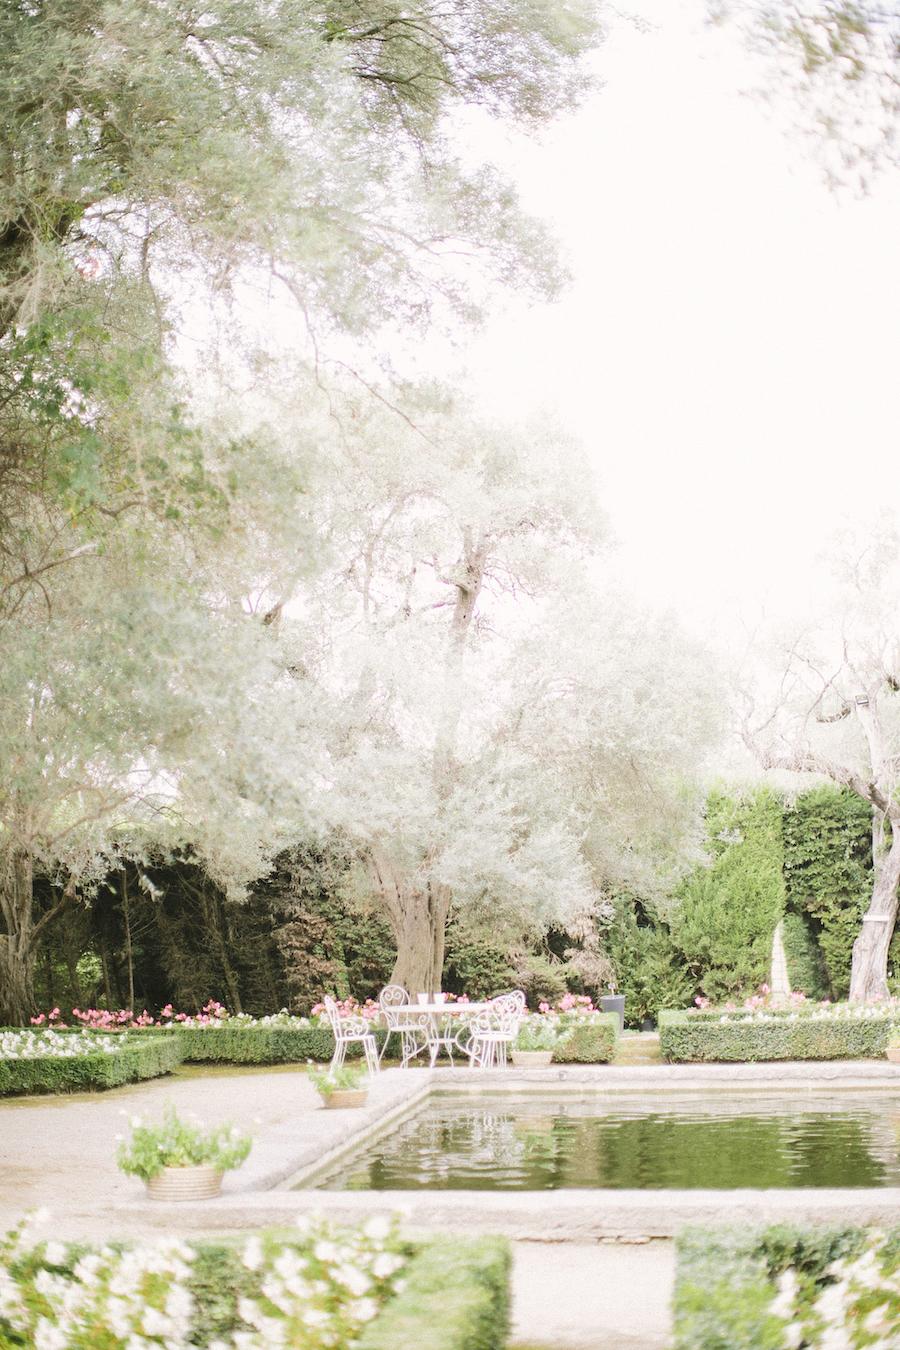 saya-photography-wedding-photographer-french-riviera-bastide-du-roy-12.jpg